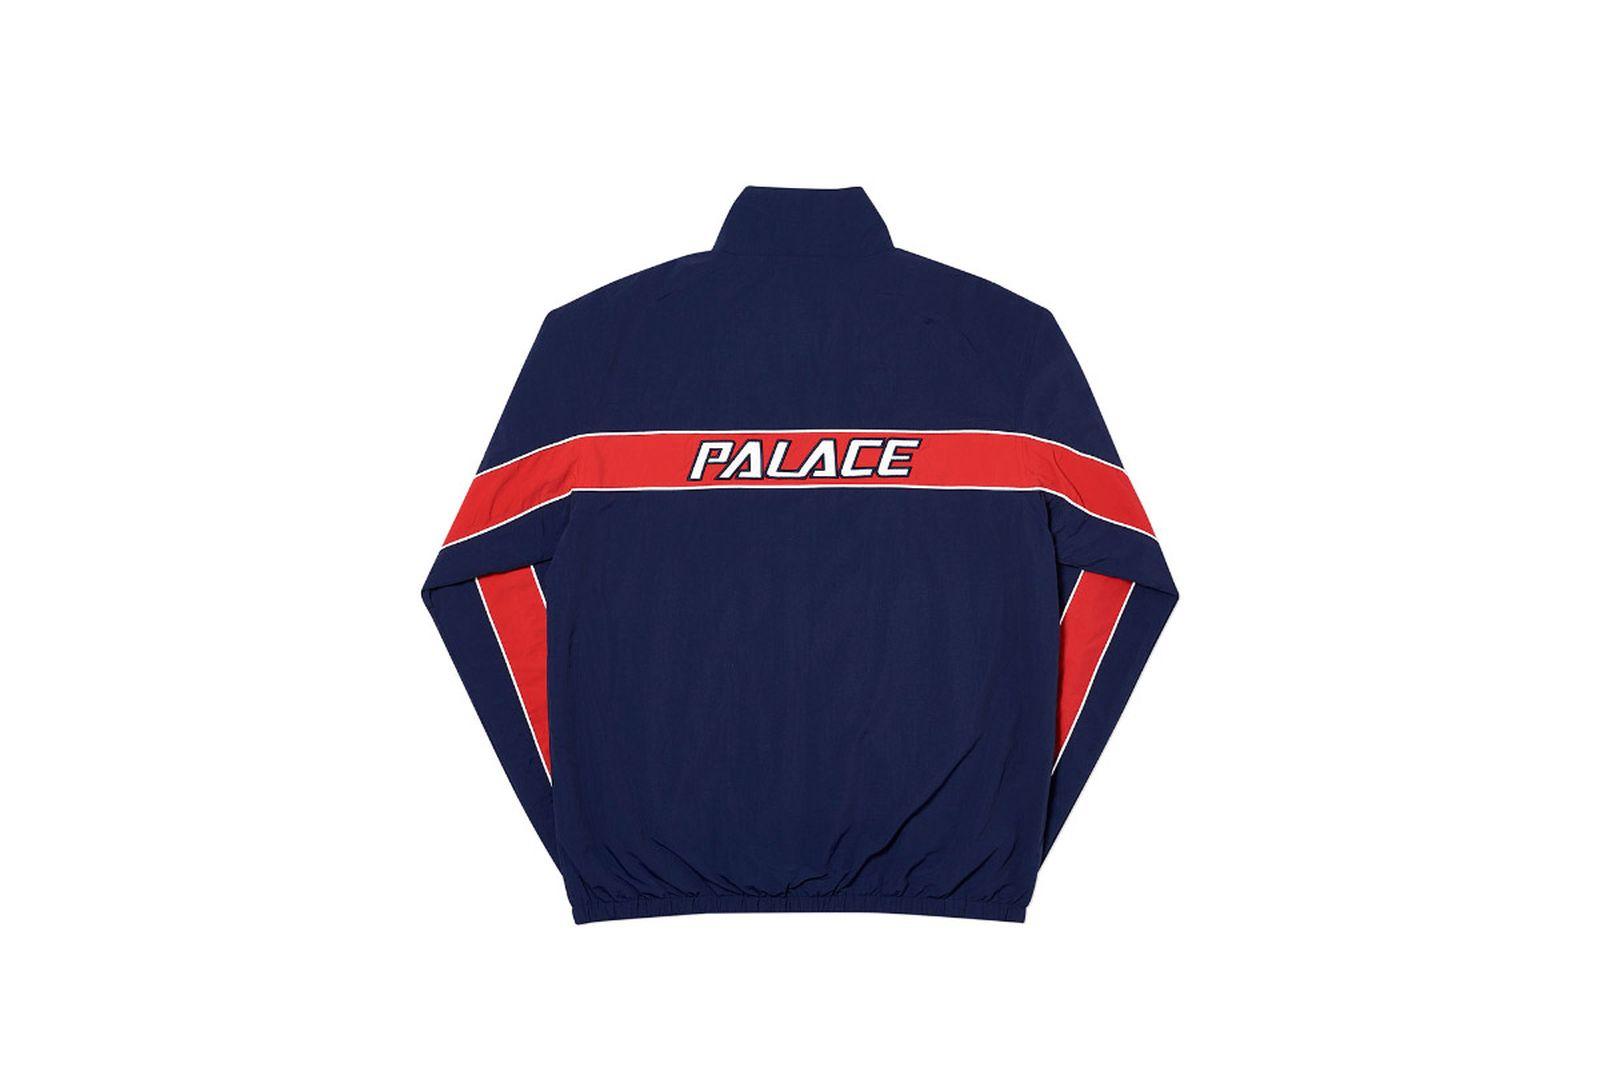 Palace 2019 Autumn Shell Racer Black Back